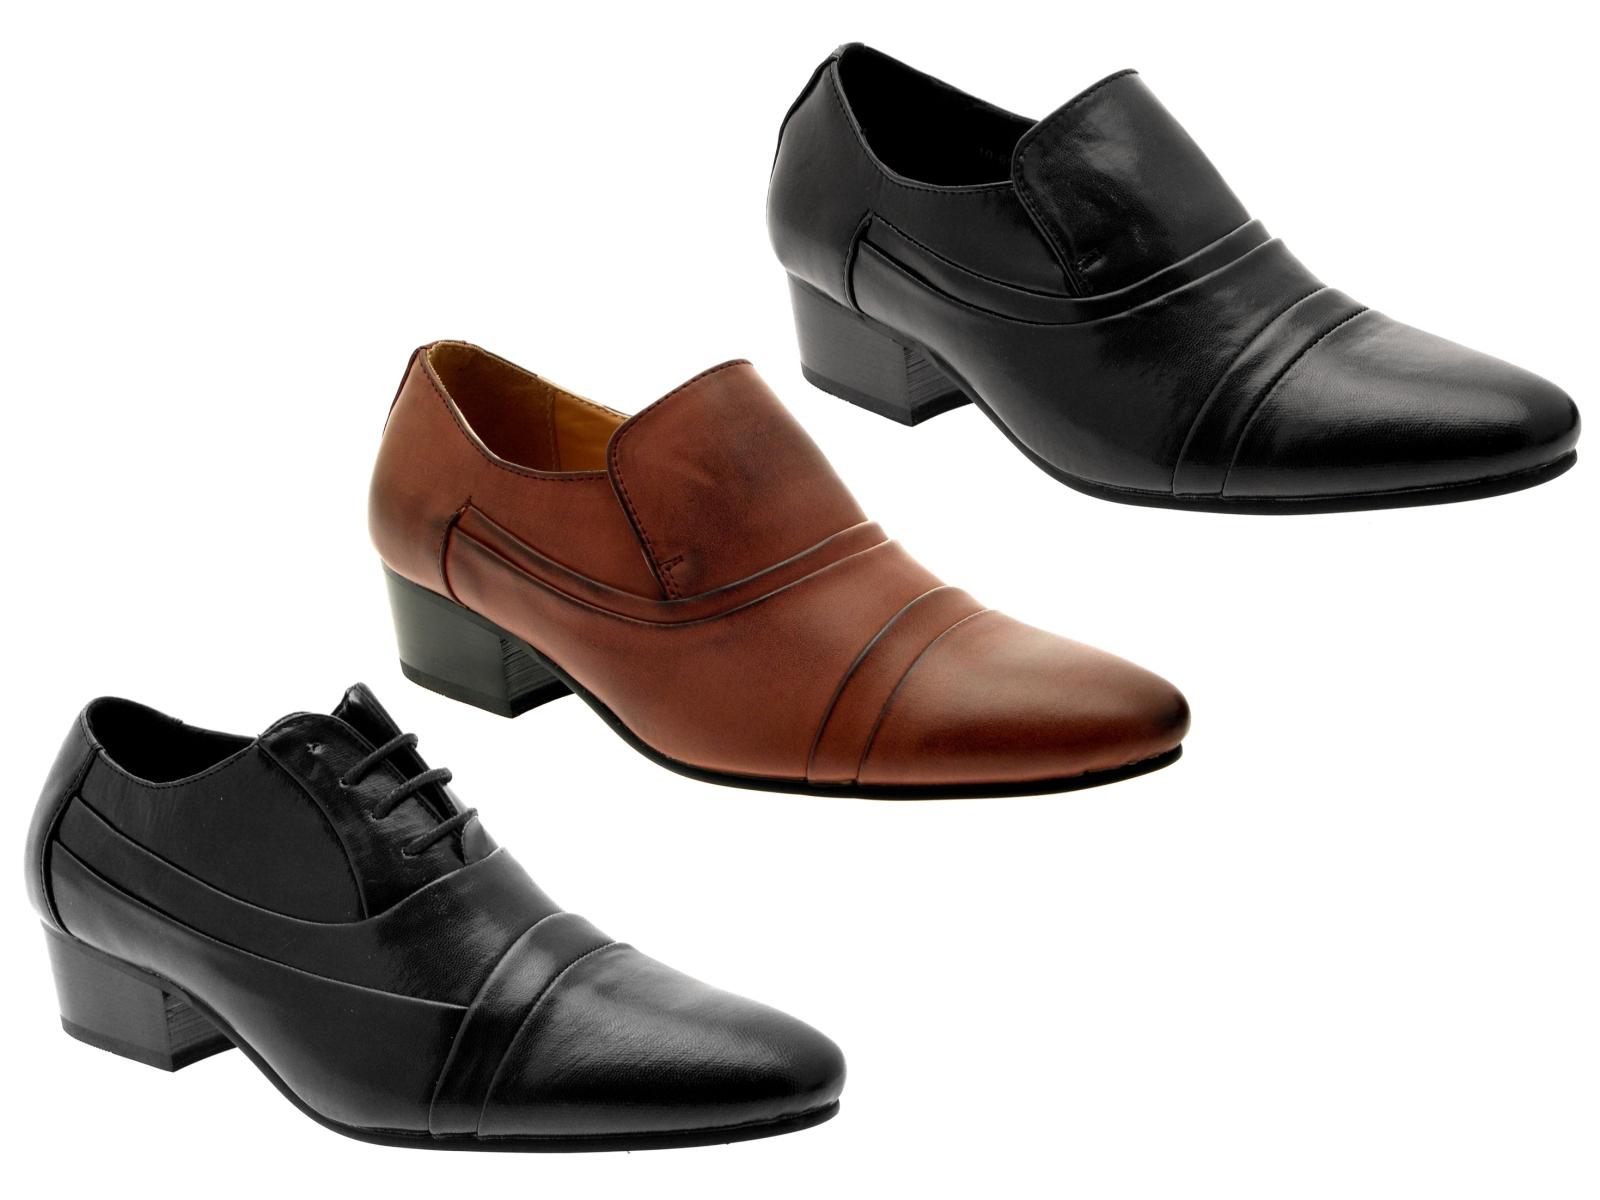 mens smart cuban heels formal wedding office shoes slip on